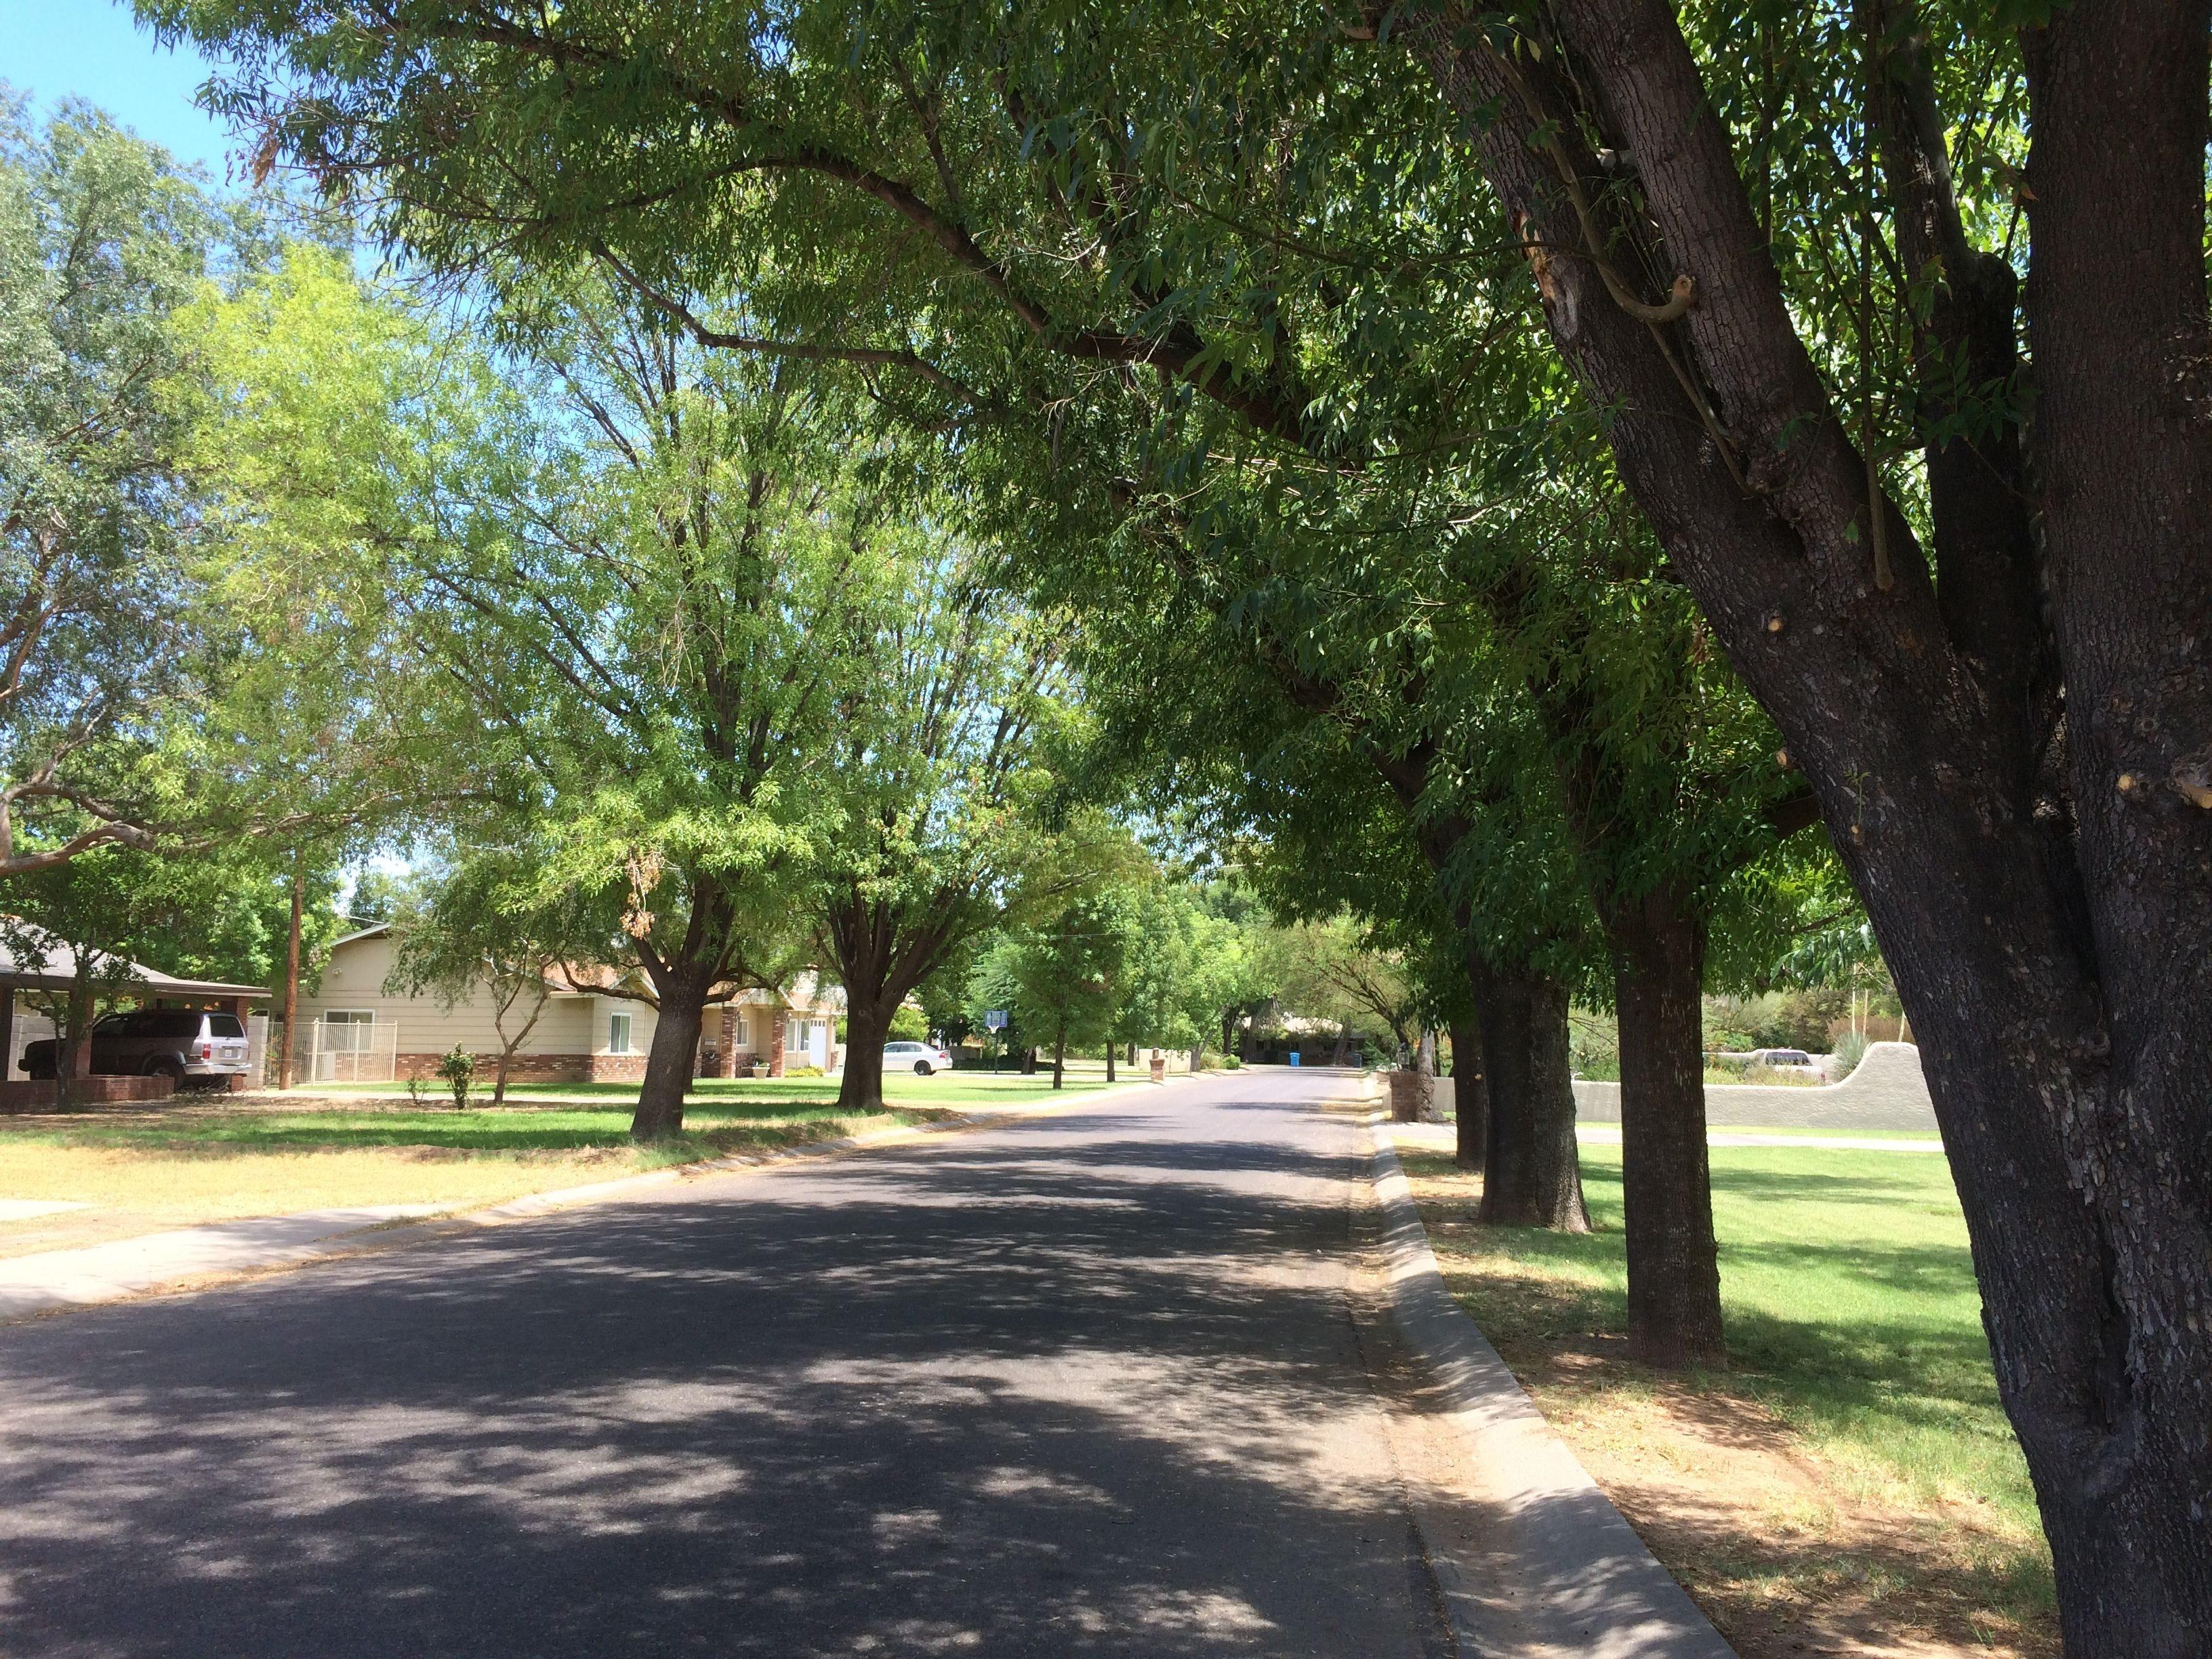 10 best shade spots to escape the blistering Phoenix heat